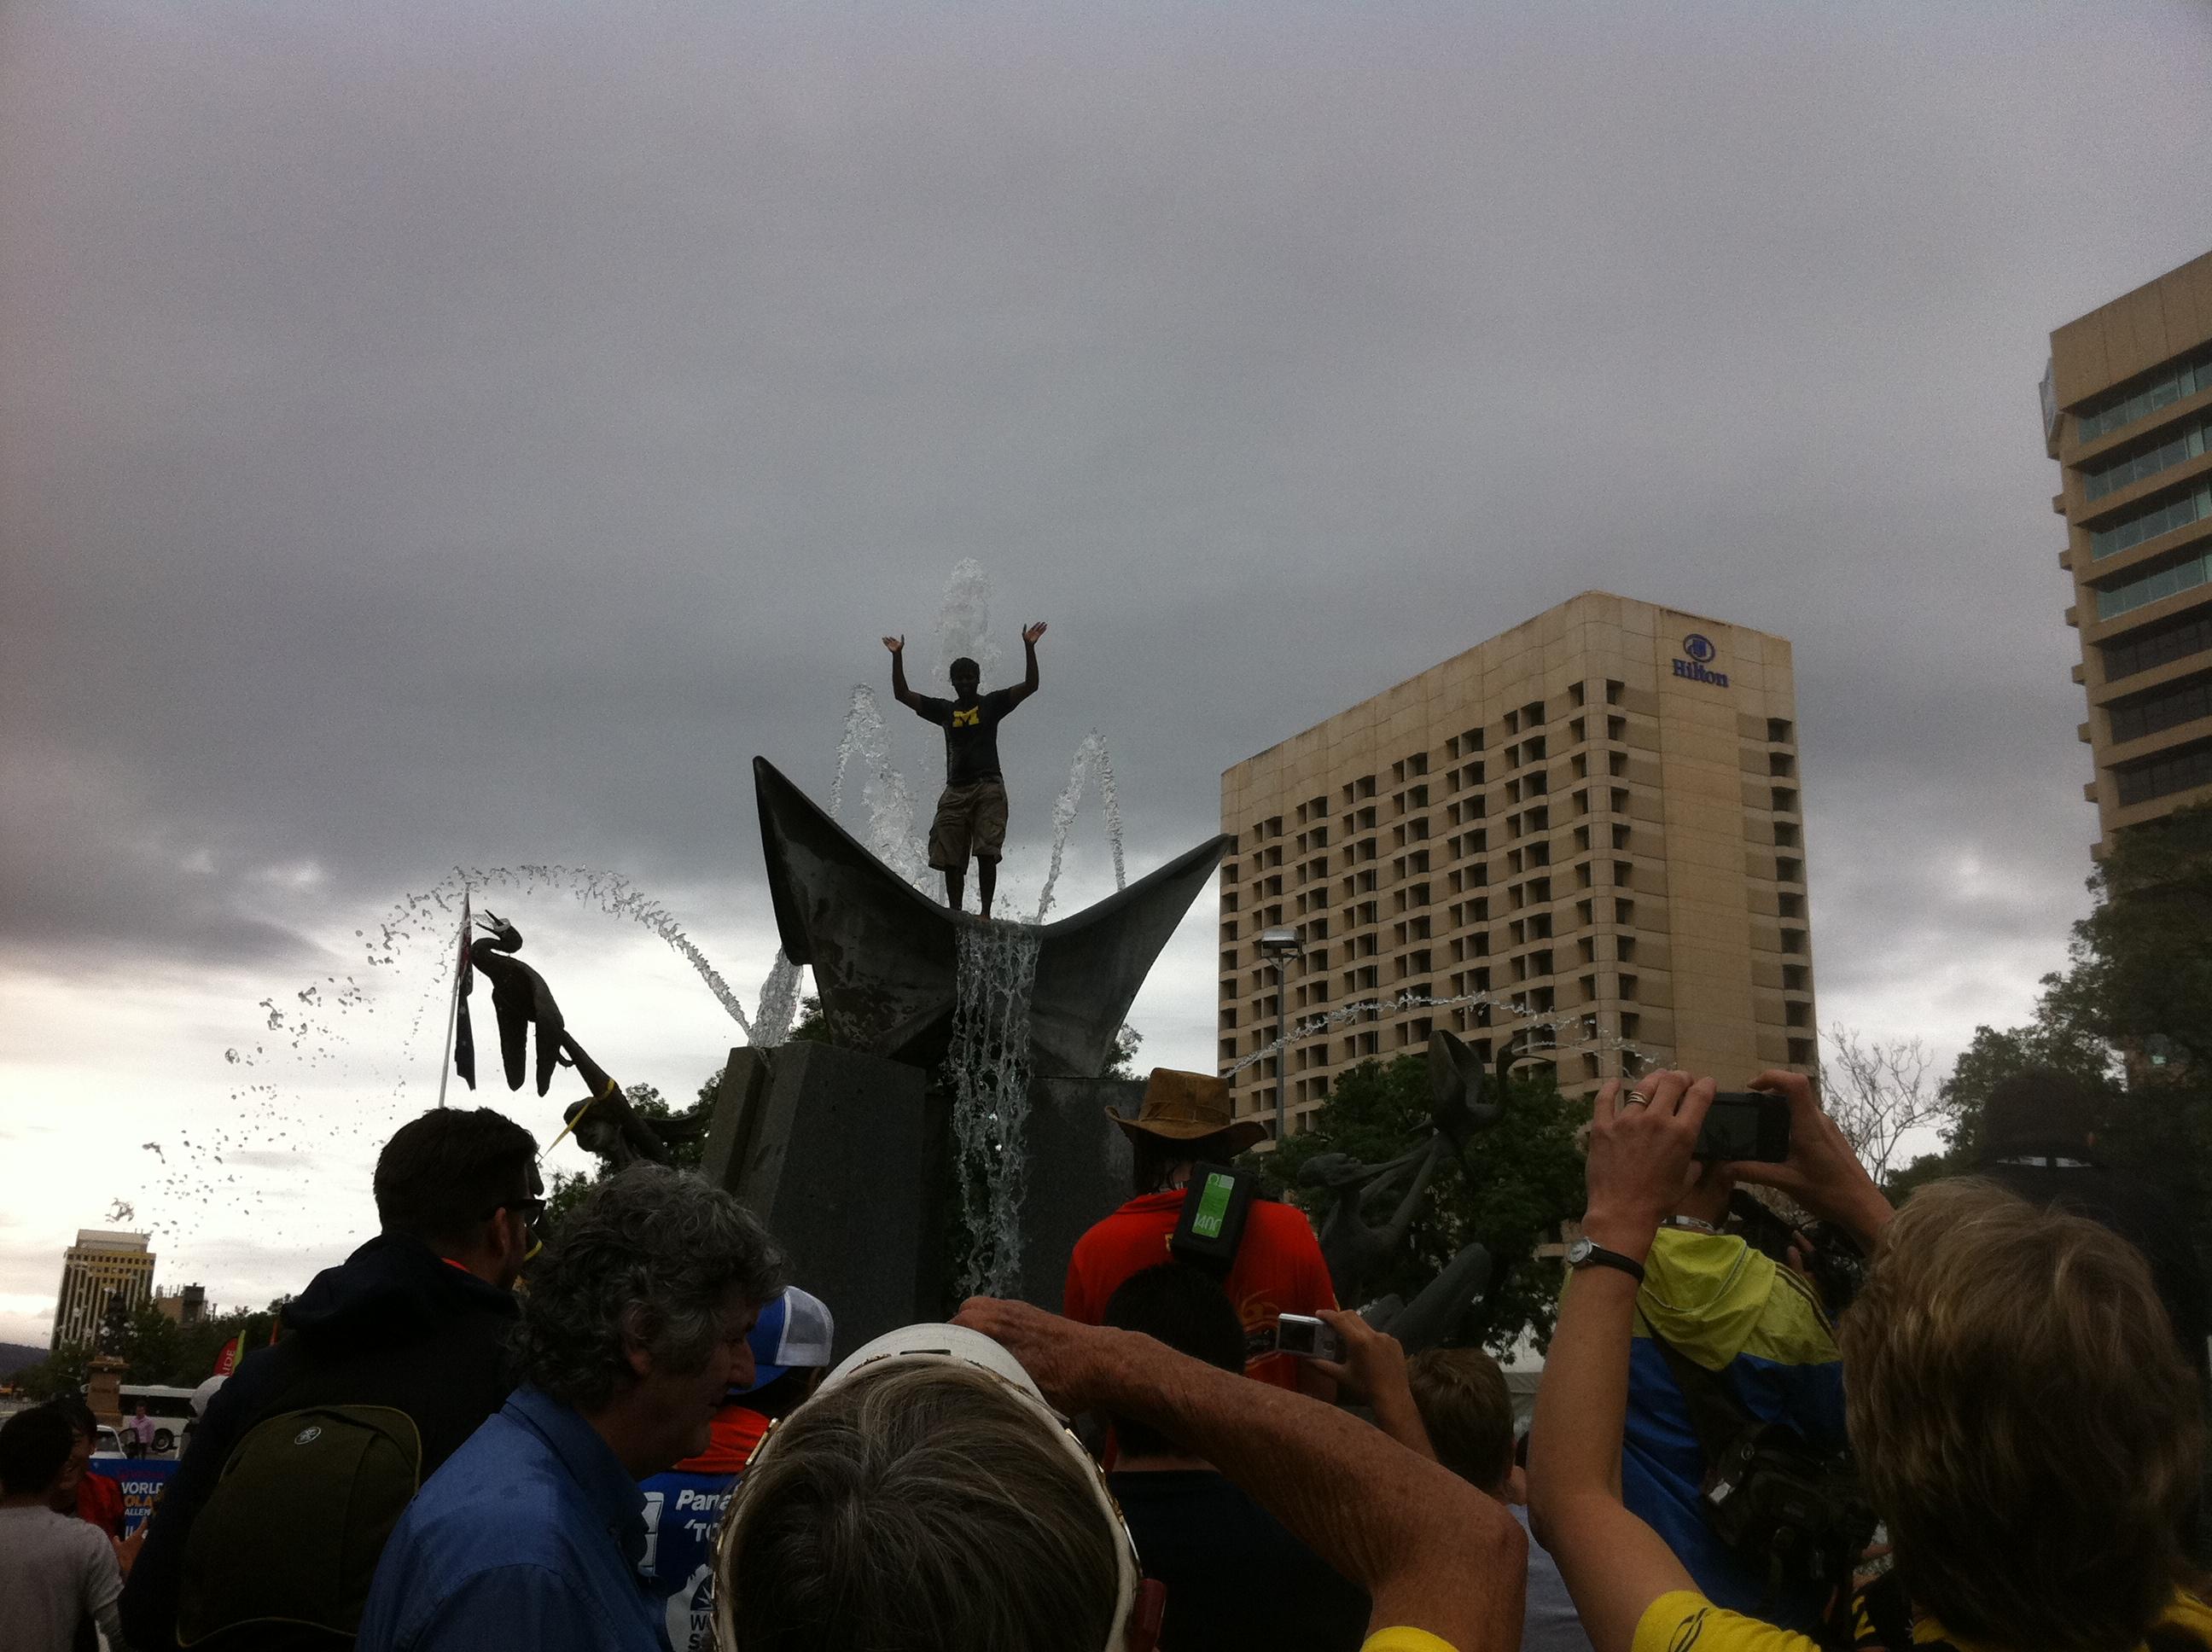 University of MI or Quantum team member reaching the top of the Victoria Fountain